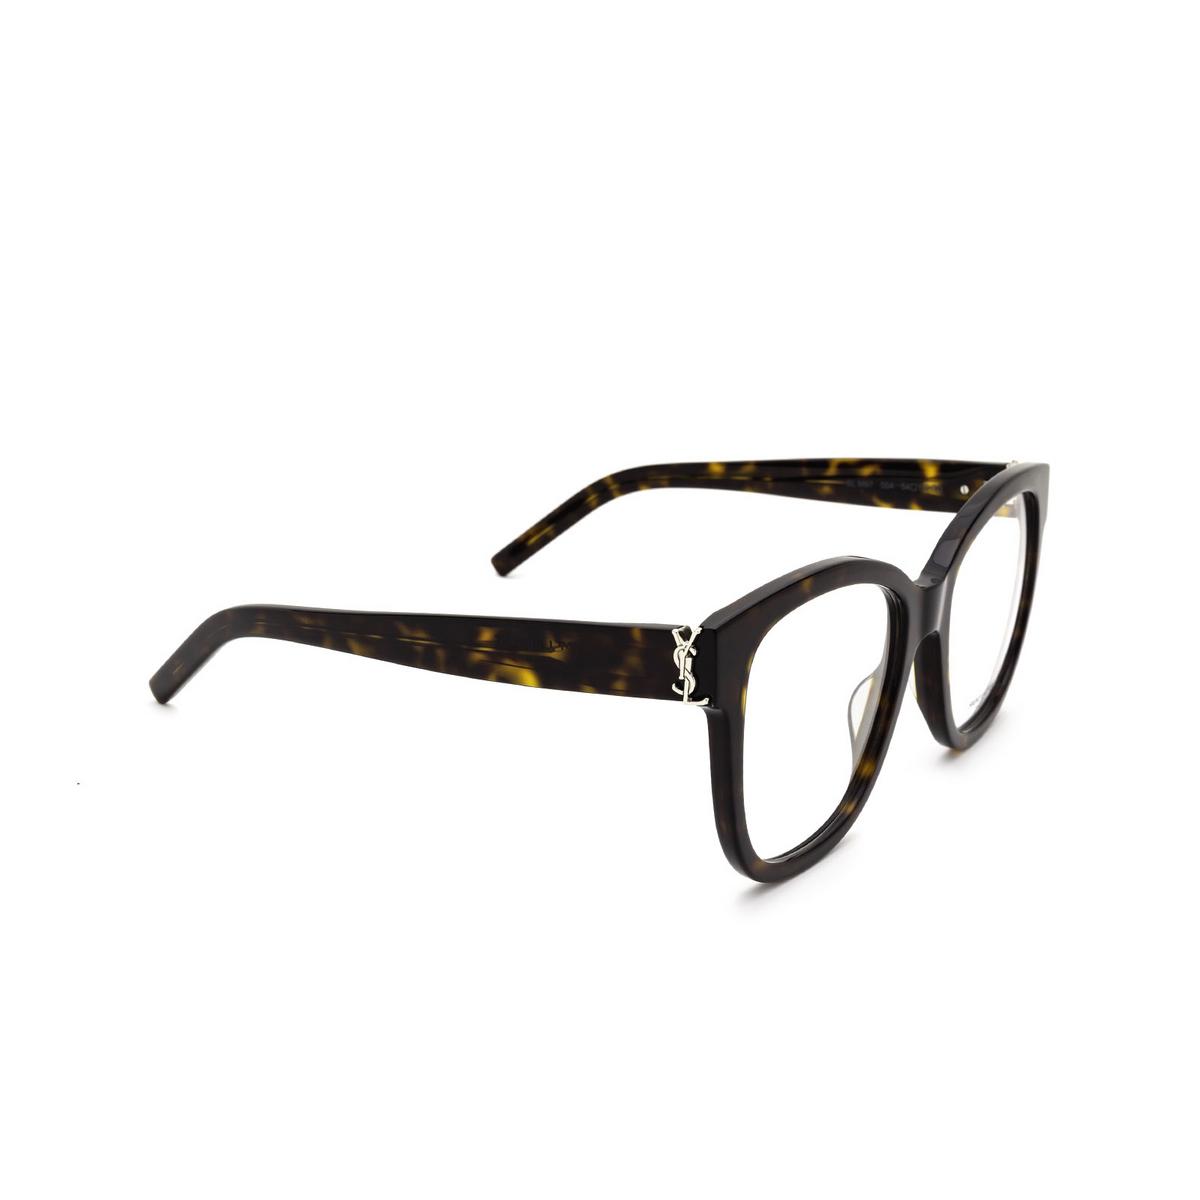 Saint Laurent® Square Eyeglasses: SL M97 color Dark Havana 004 - three-quarters view.